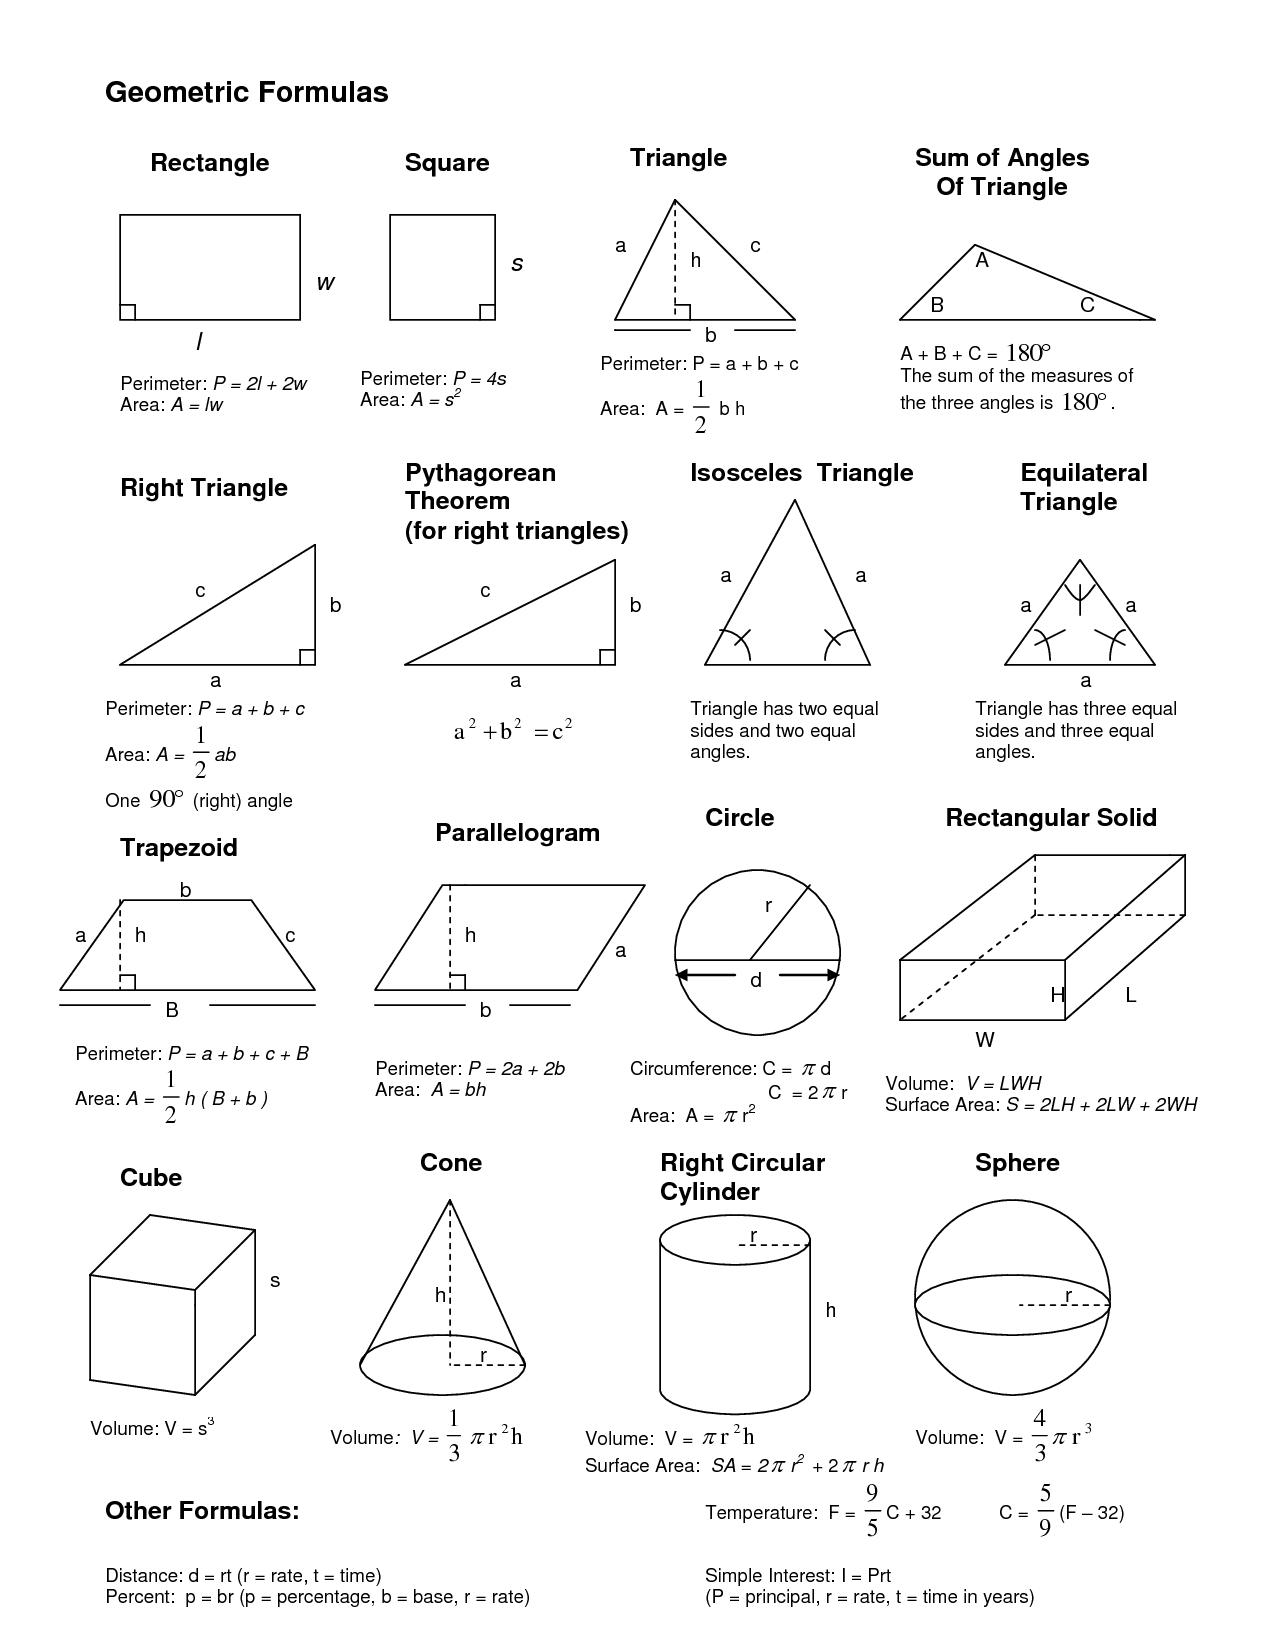 Geometrical Formulas Mas With Images